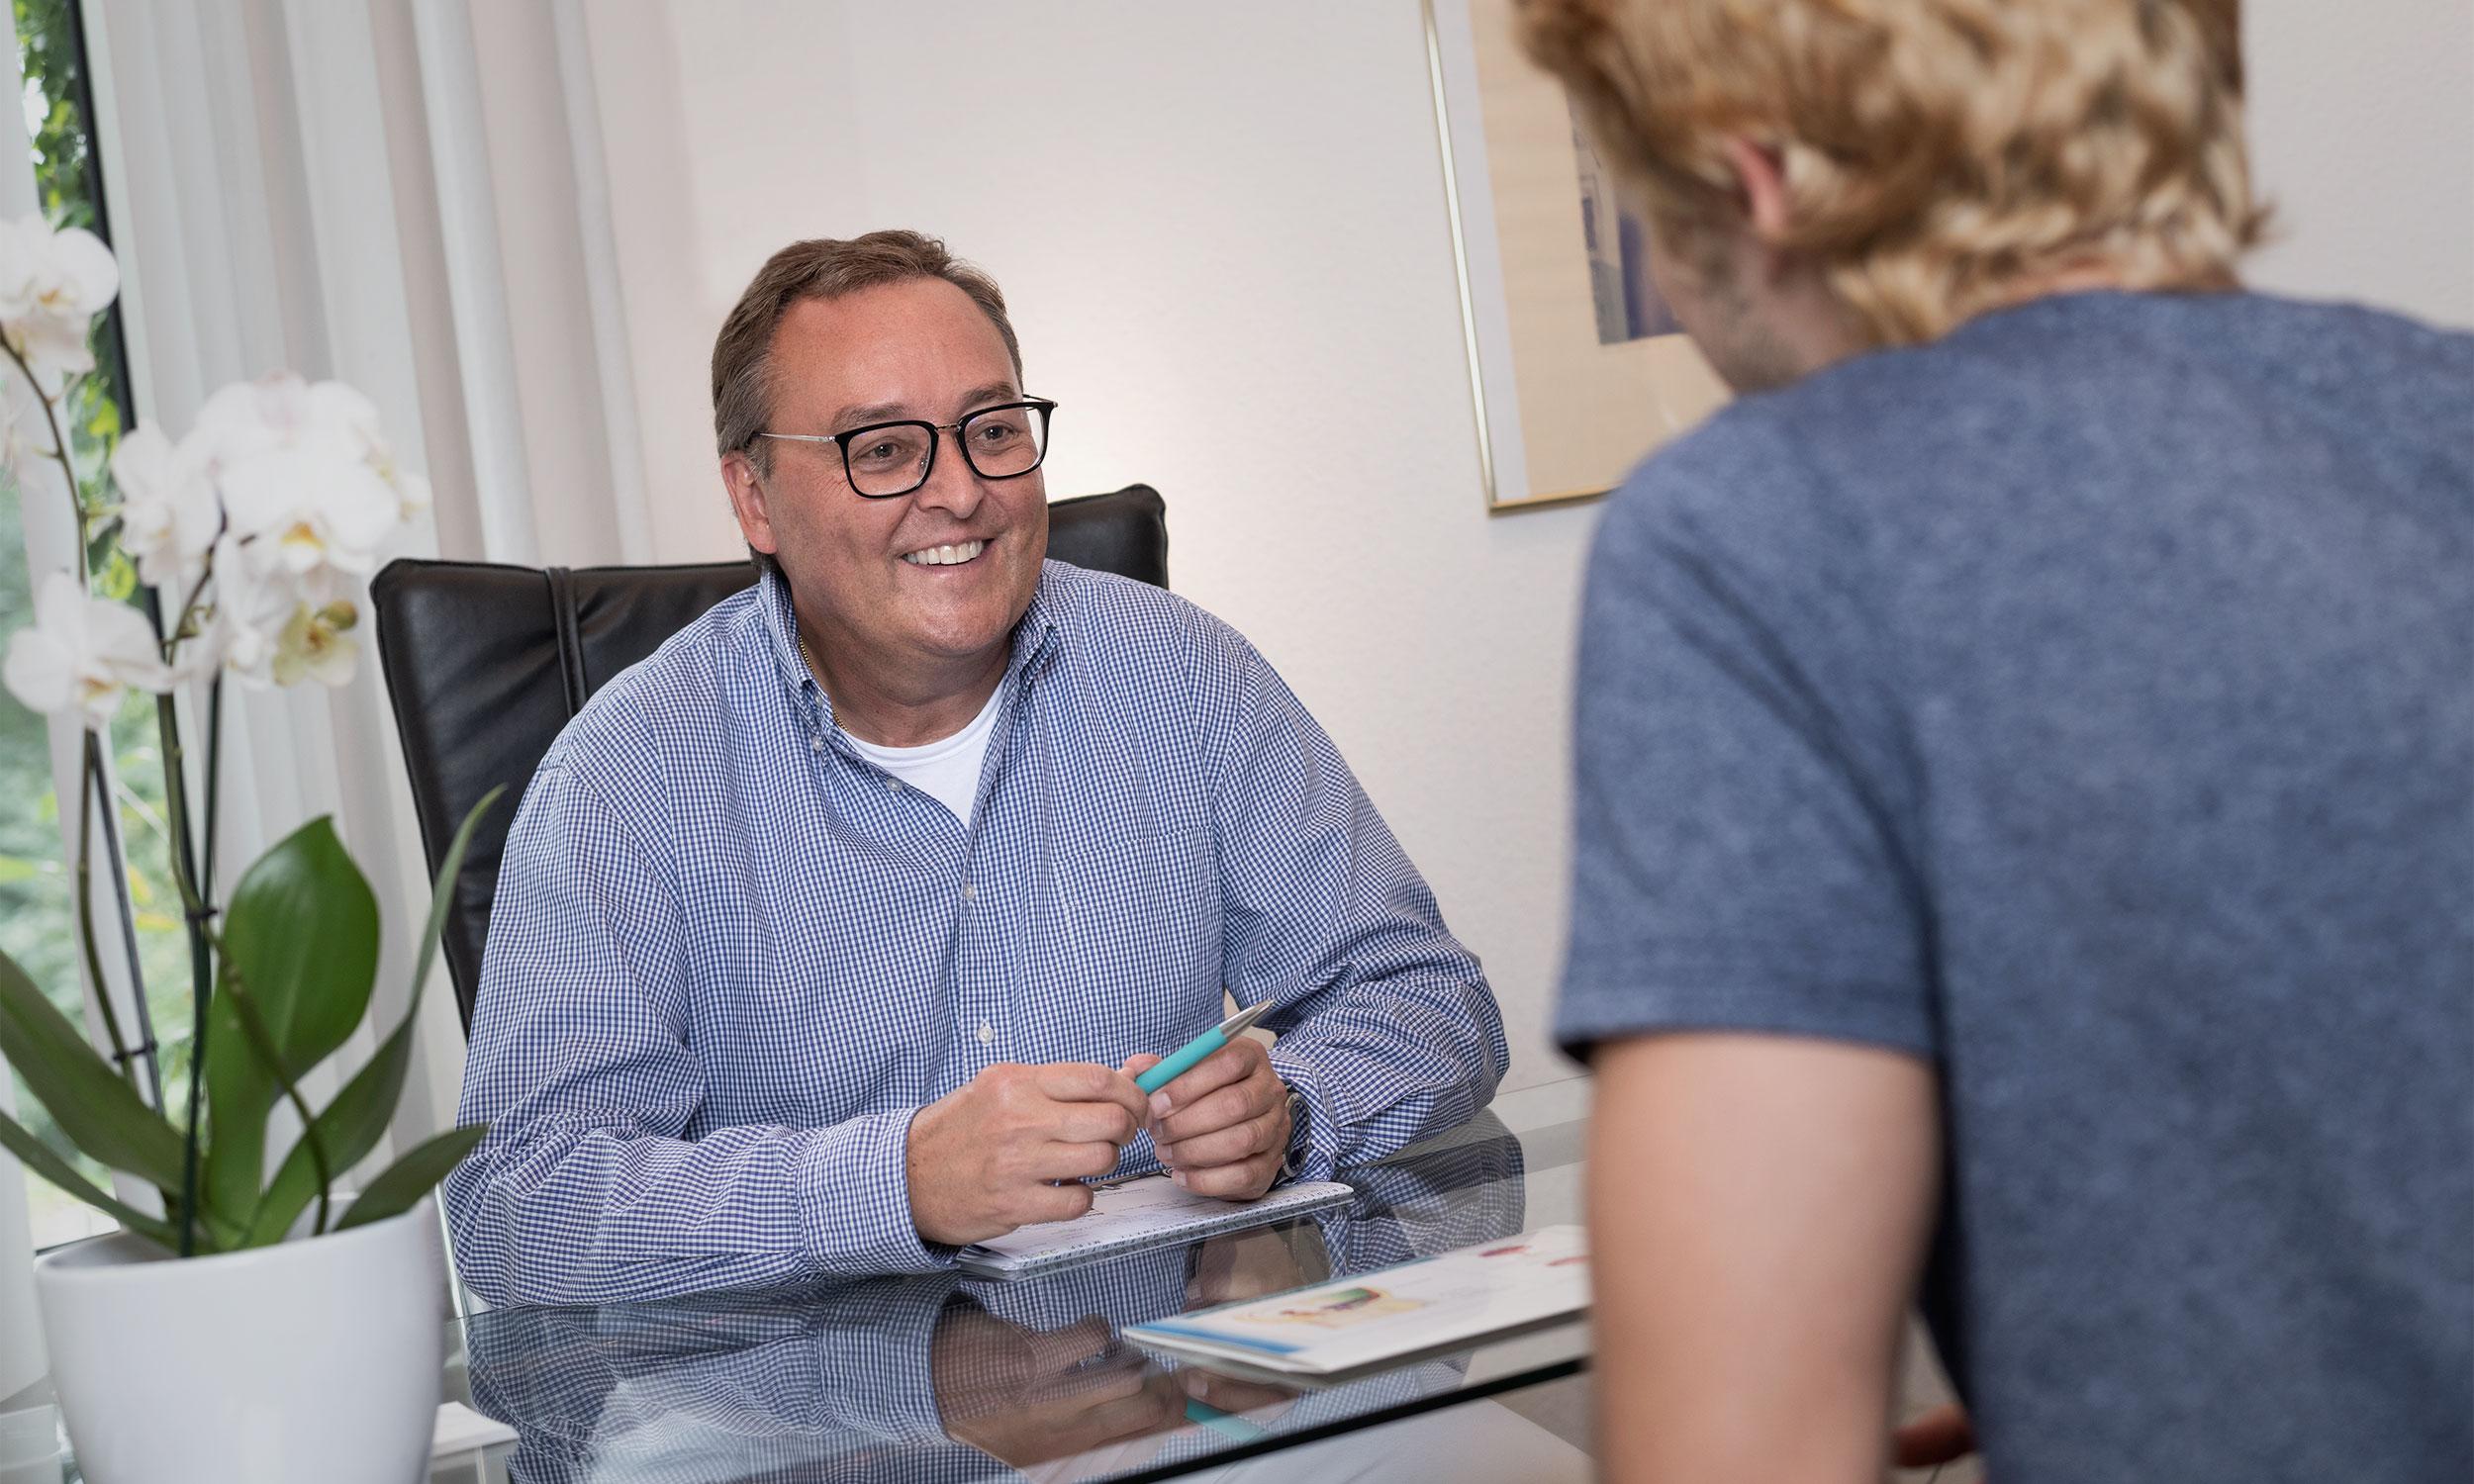 Urologe Solingen – Dr. med. Andreas Kunze, Facharzt für Urologie und Andrologie